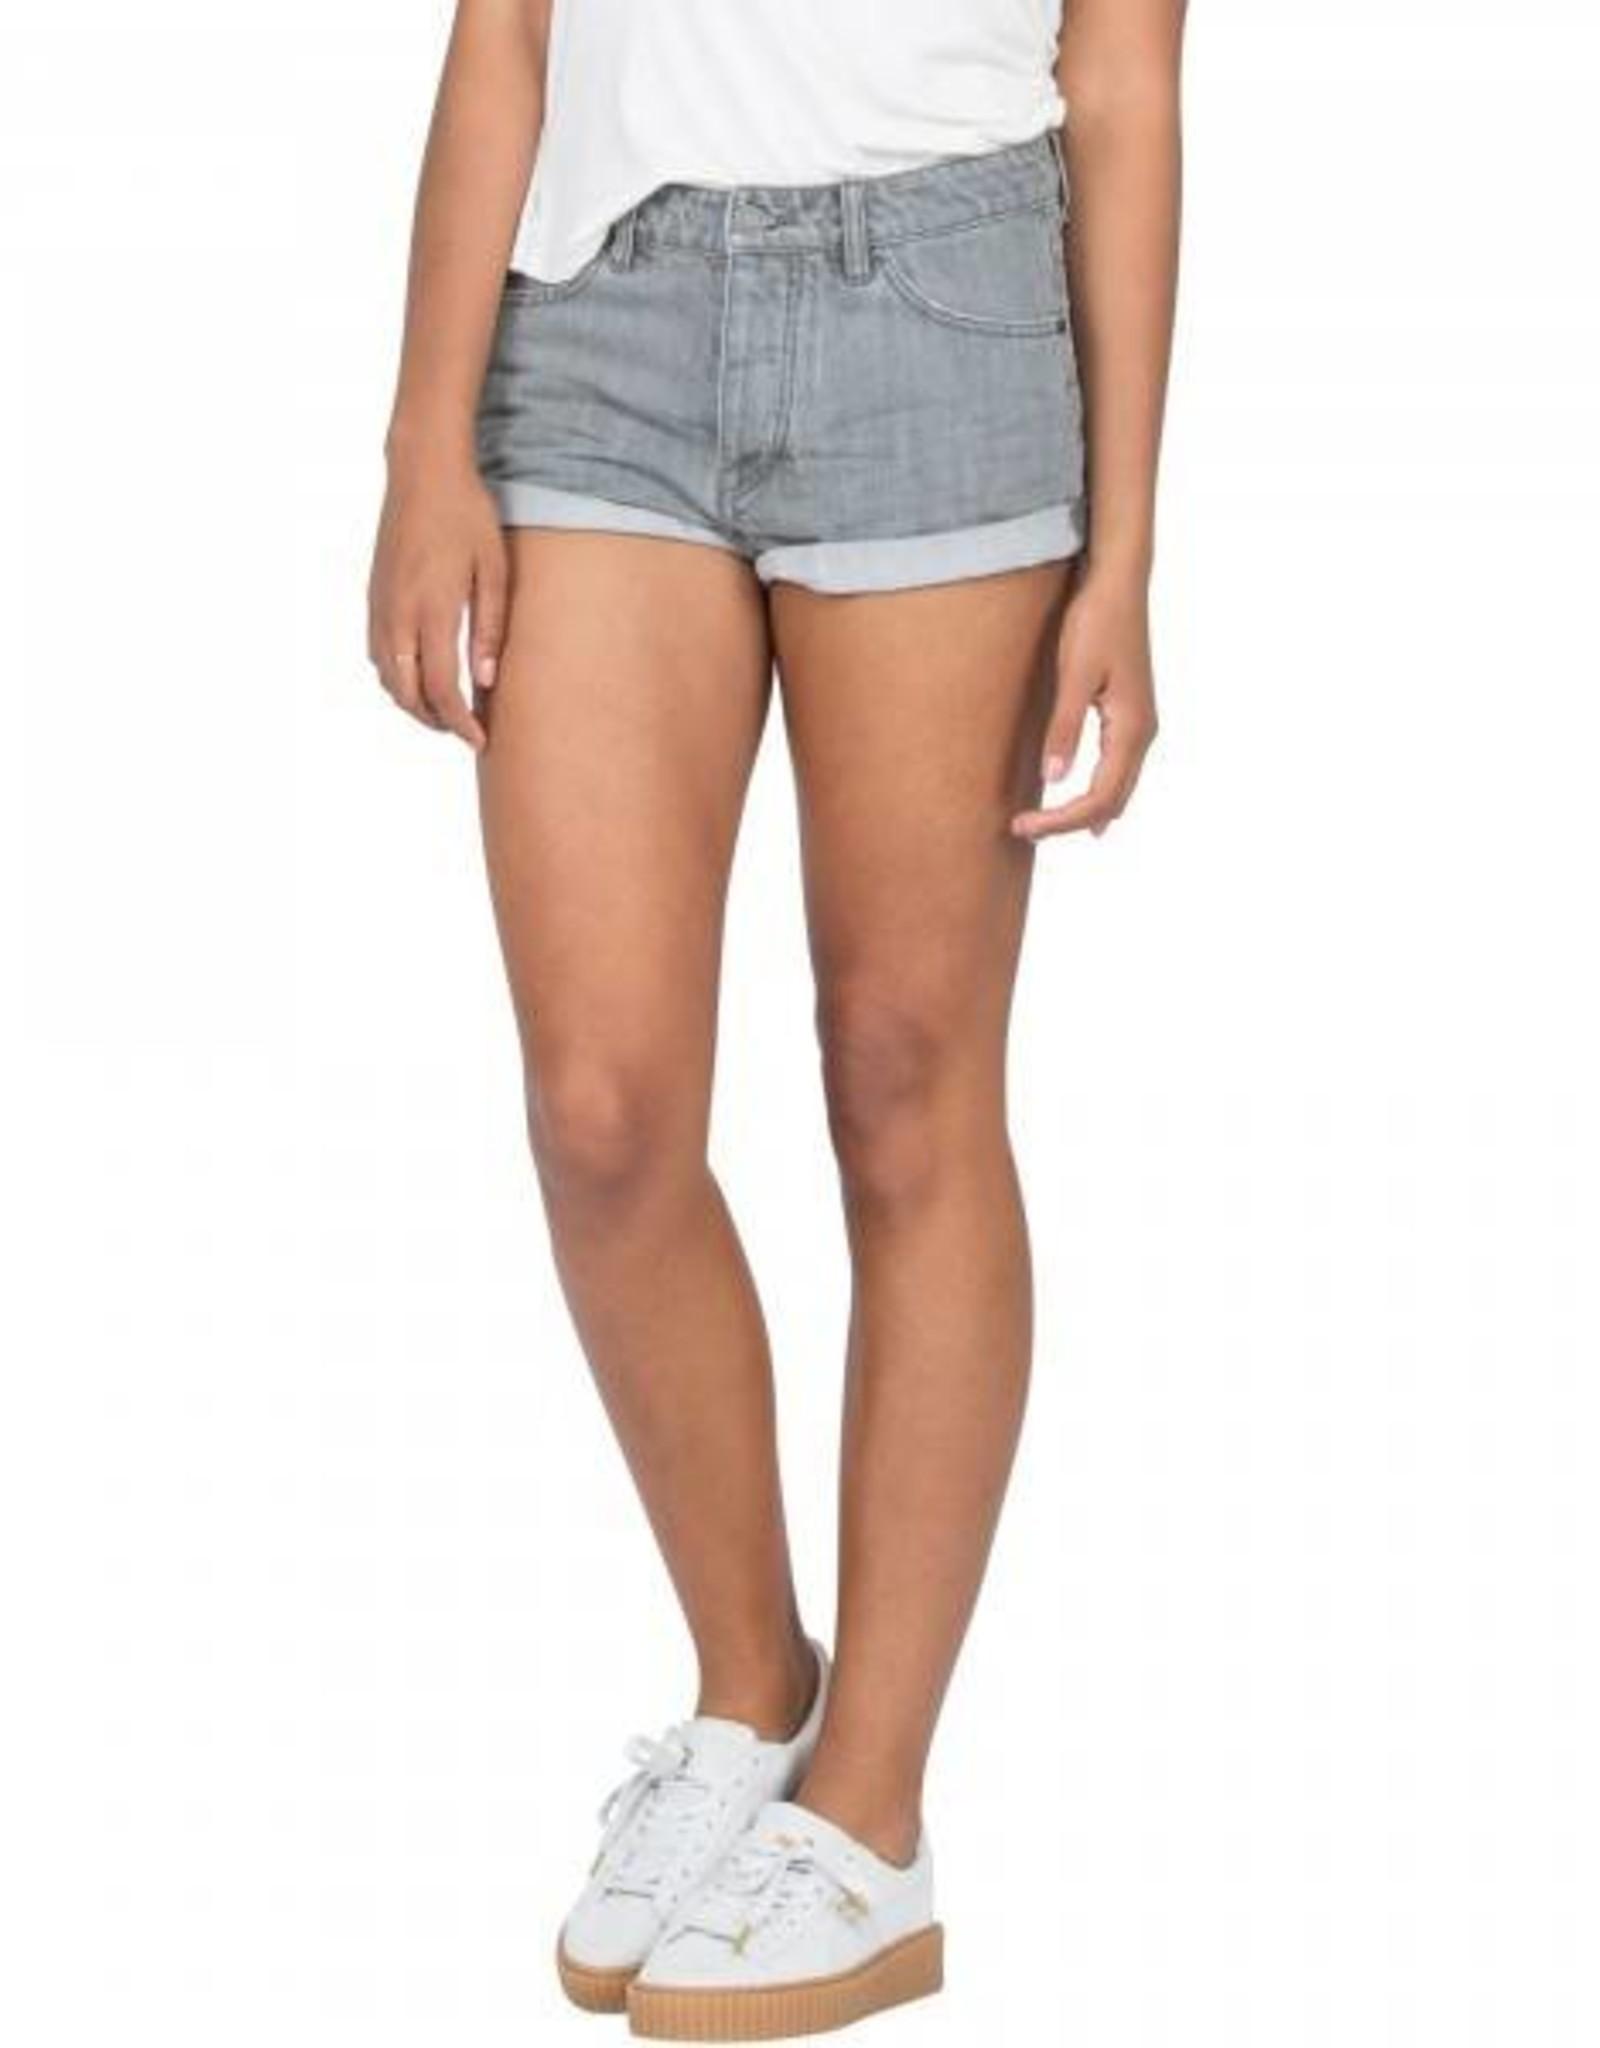 Volcom Volcom - STONED Shorts Rolled - Grey Vint. -